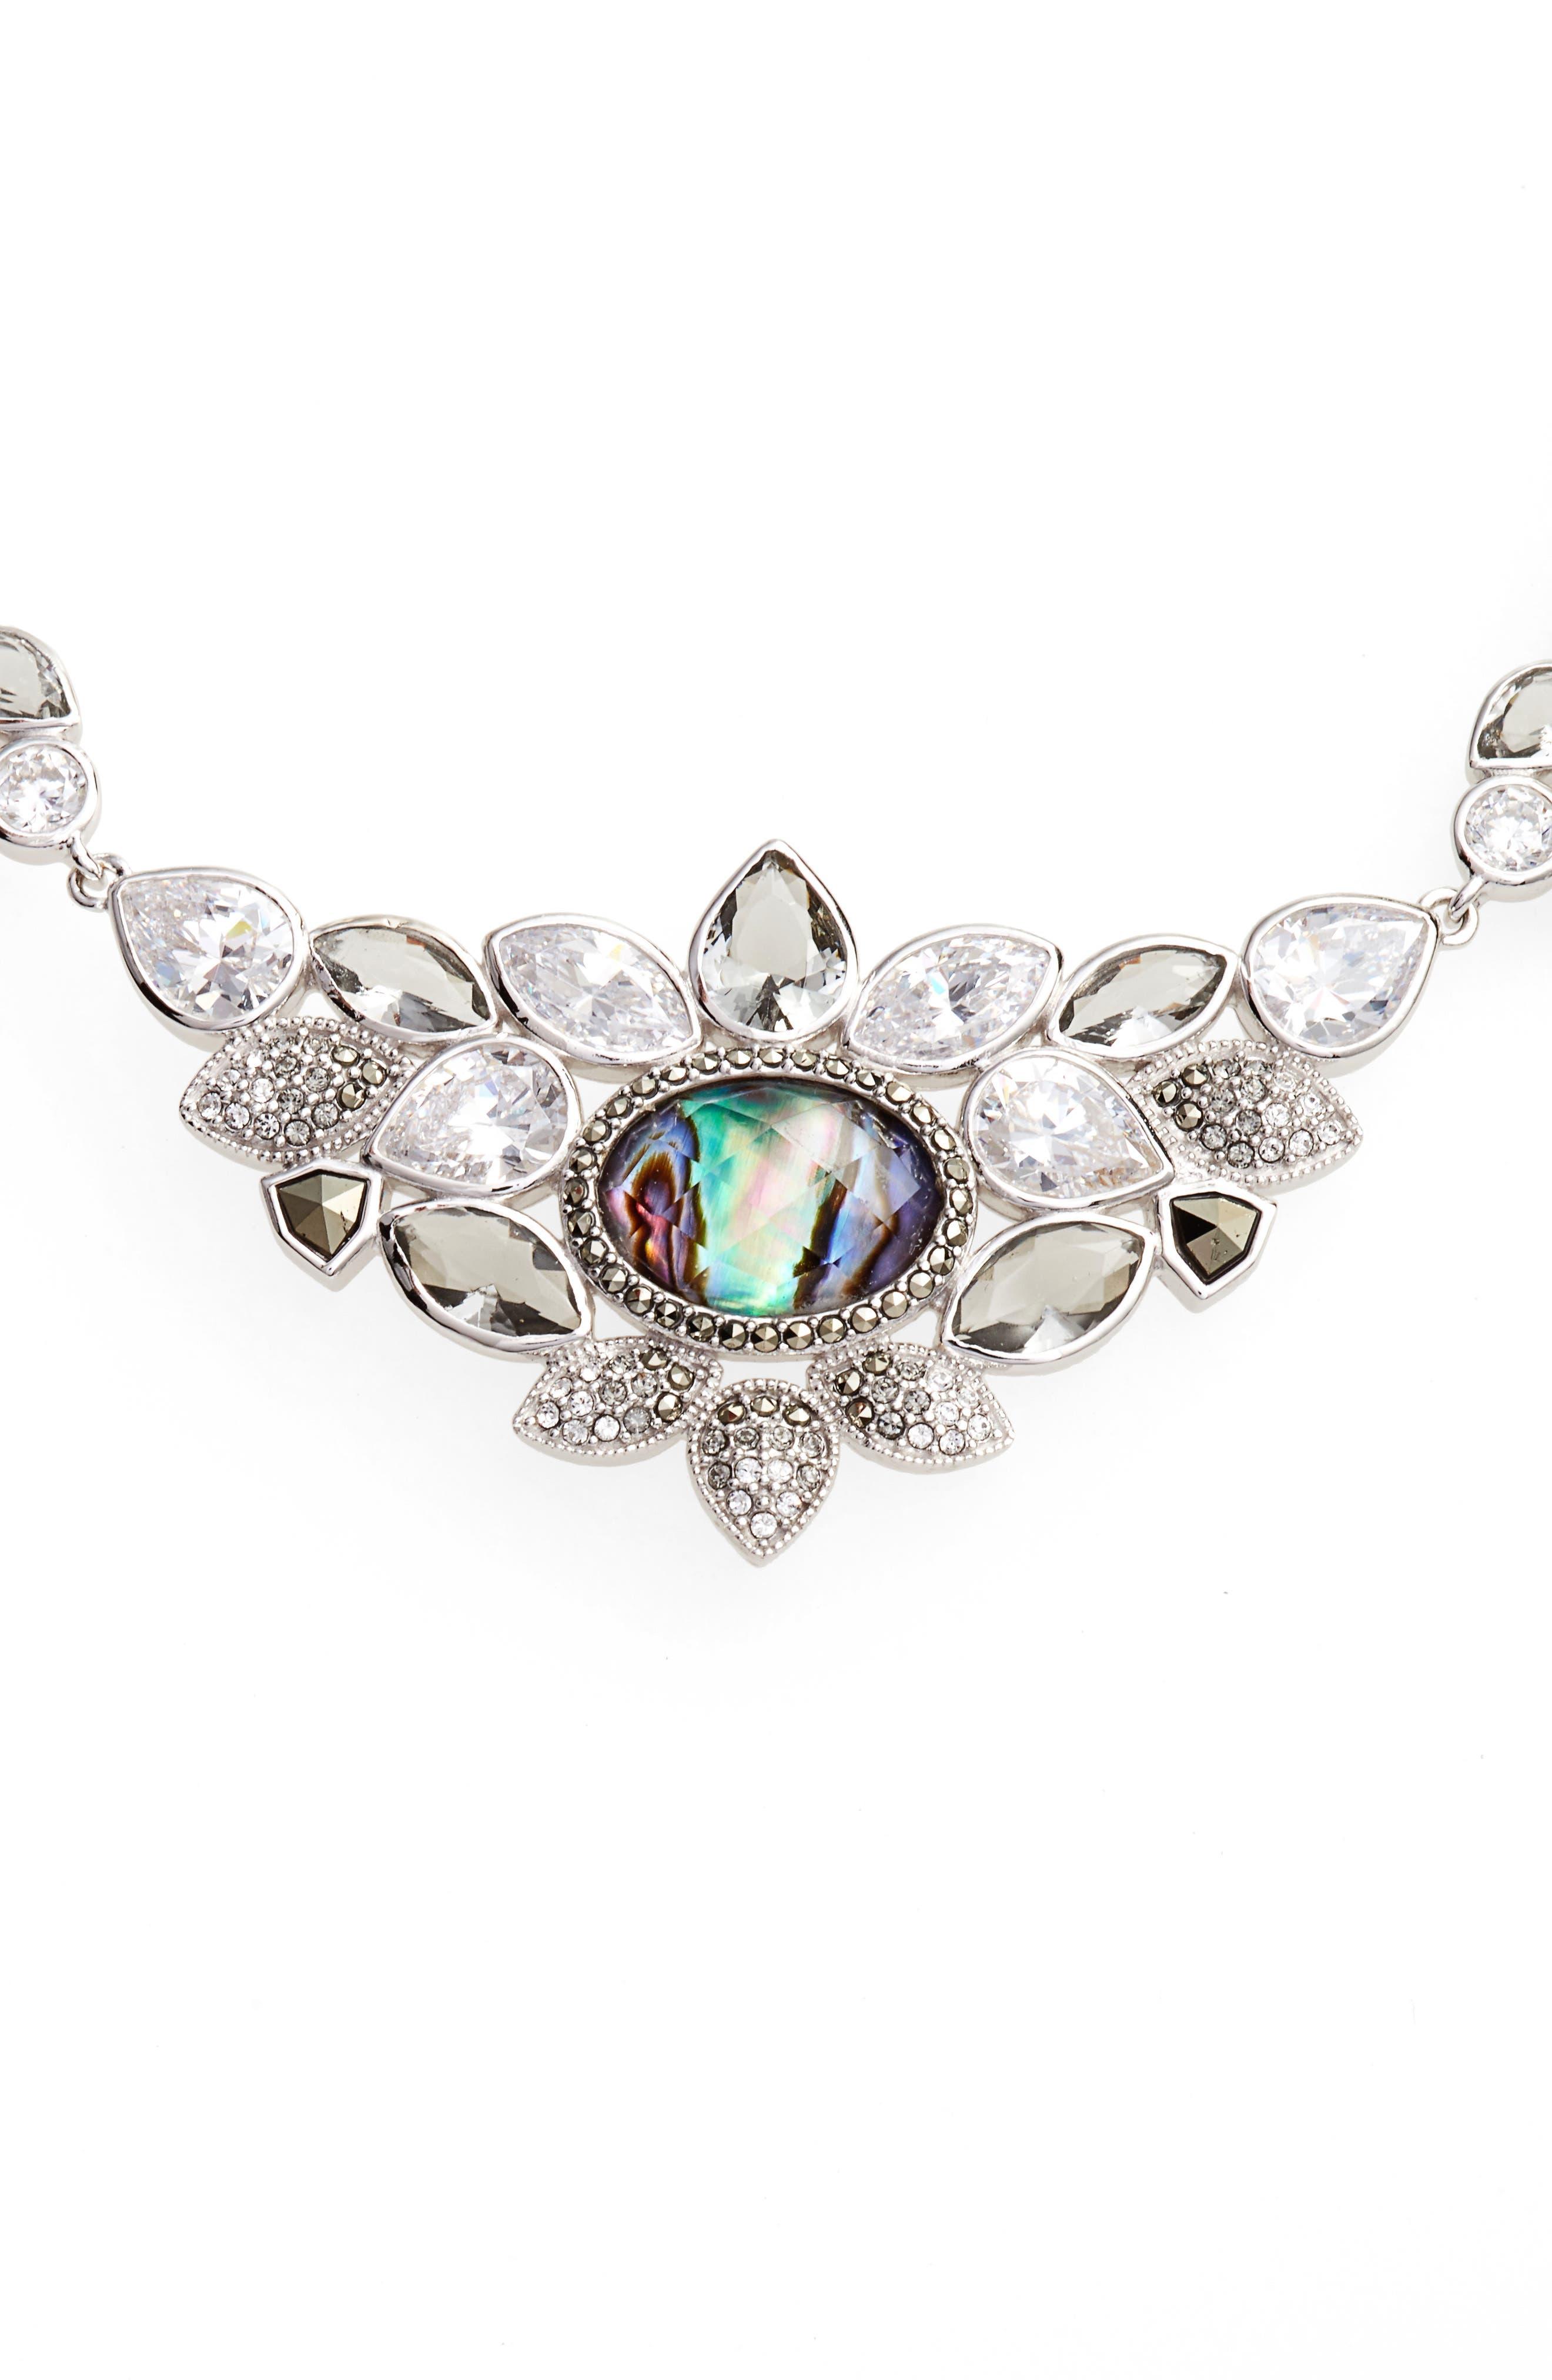 Crystal Collar Necklace,                             Main thumbnail 1, color,                             400